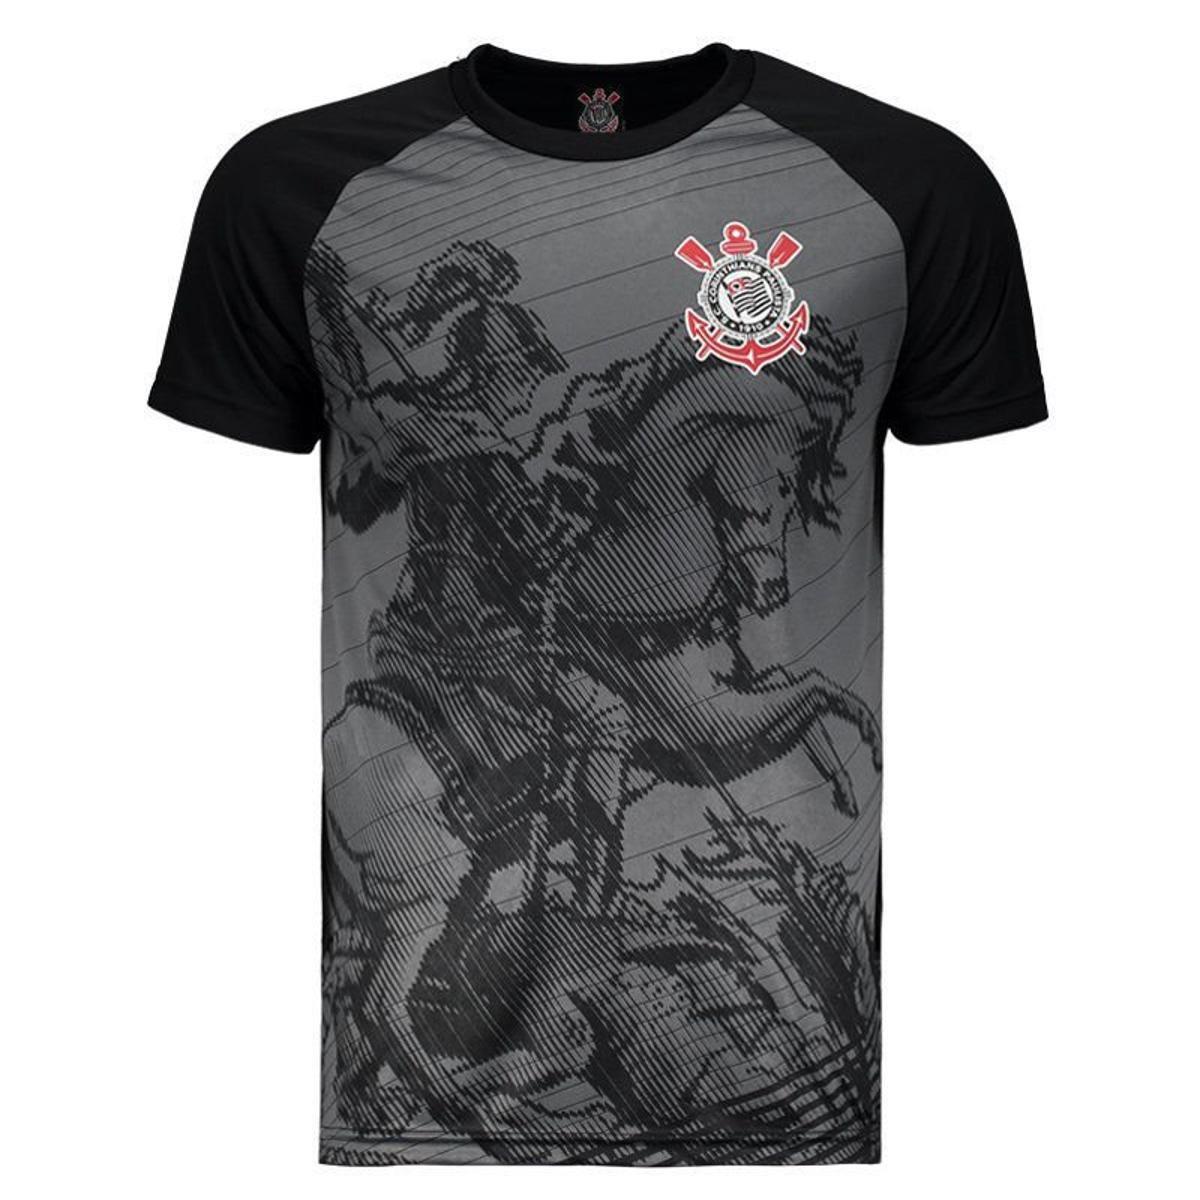 07a9c2a8cc9df Camisa Corinthians Guerreiro 2.0 Masculina - Preto - Compre Agora ...